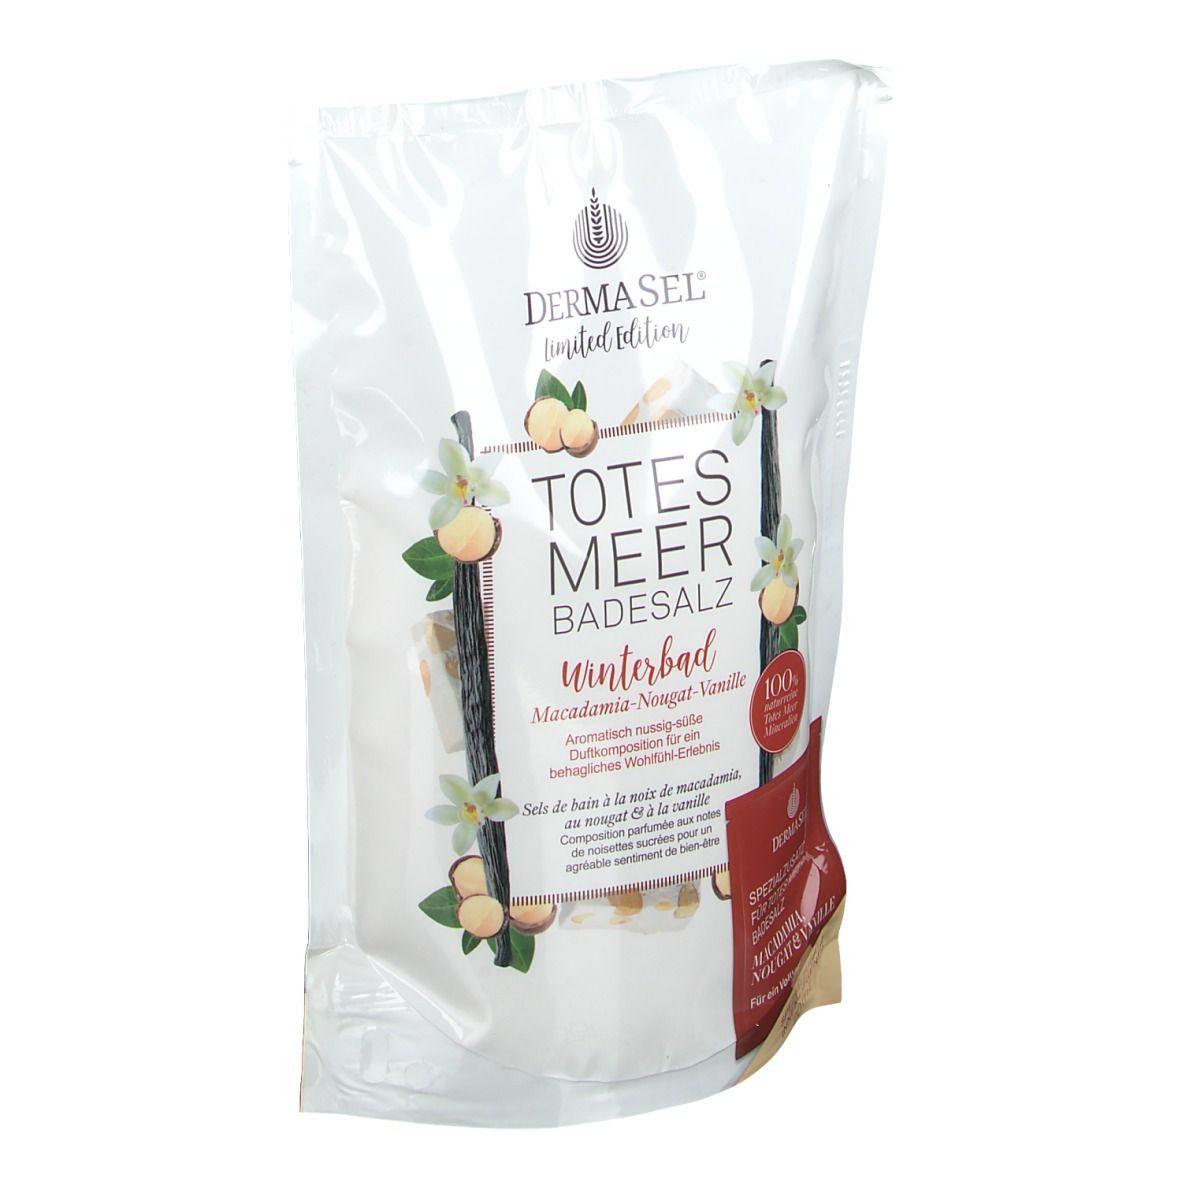 DermaSel® Totes Meer Badesalz Winterbad Macadamia-Nougat-Vanille